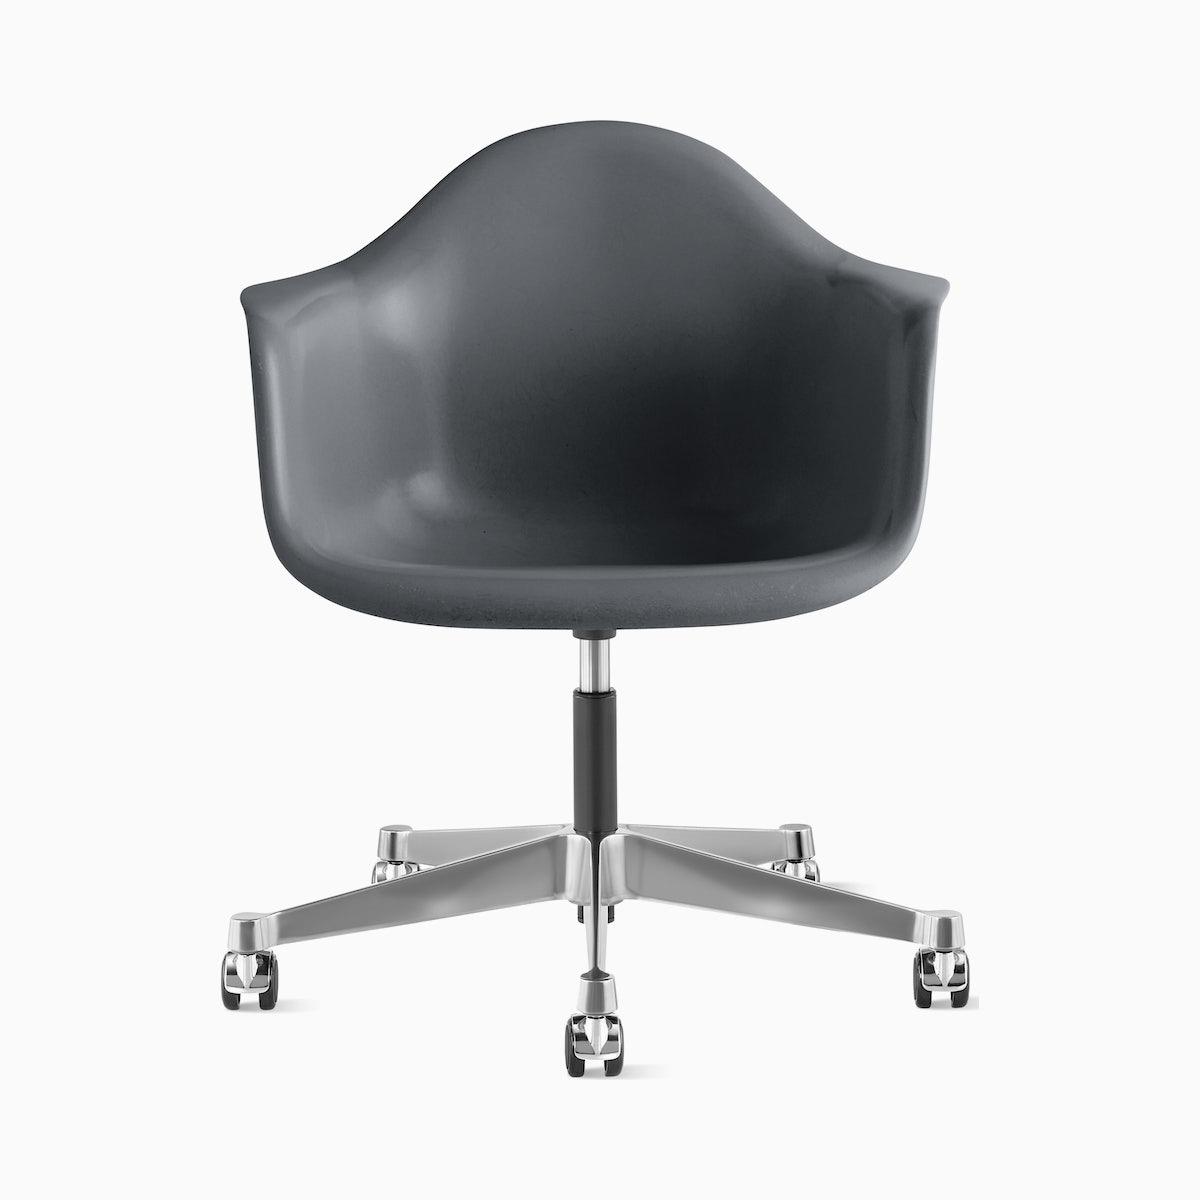 Eames Task Chair, Molded Fiberglass Armchair